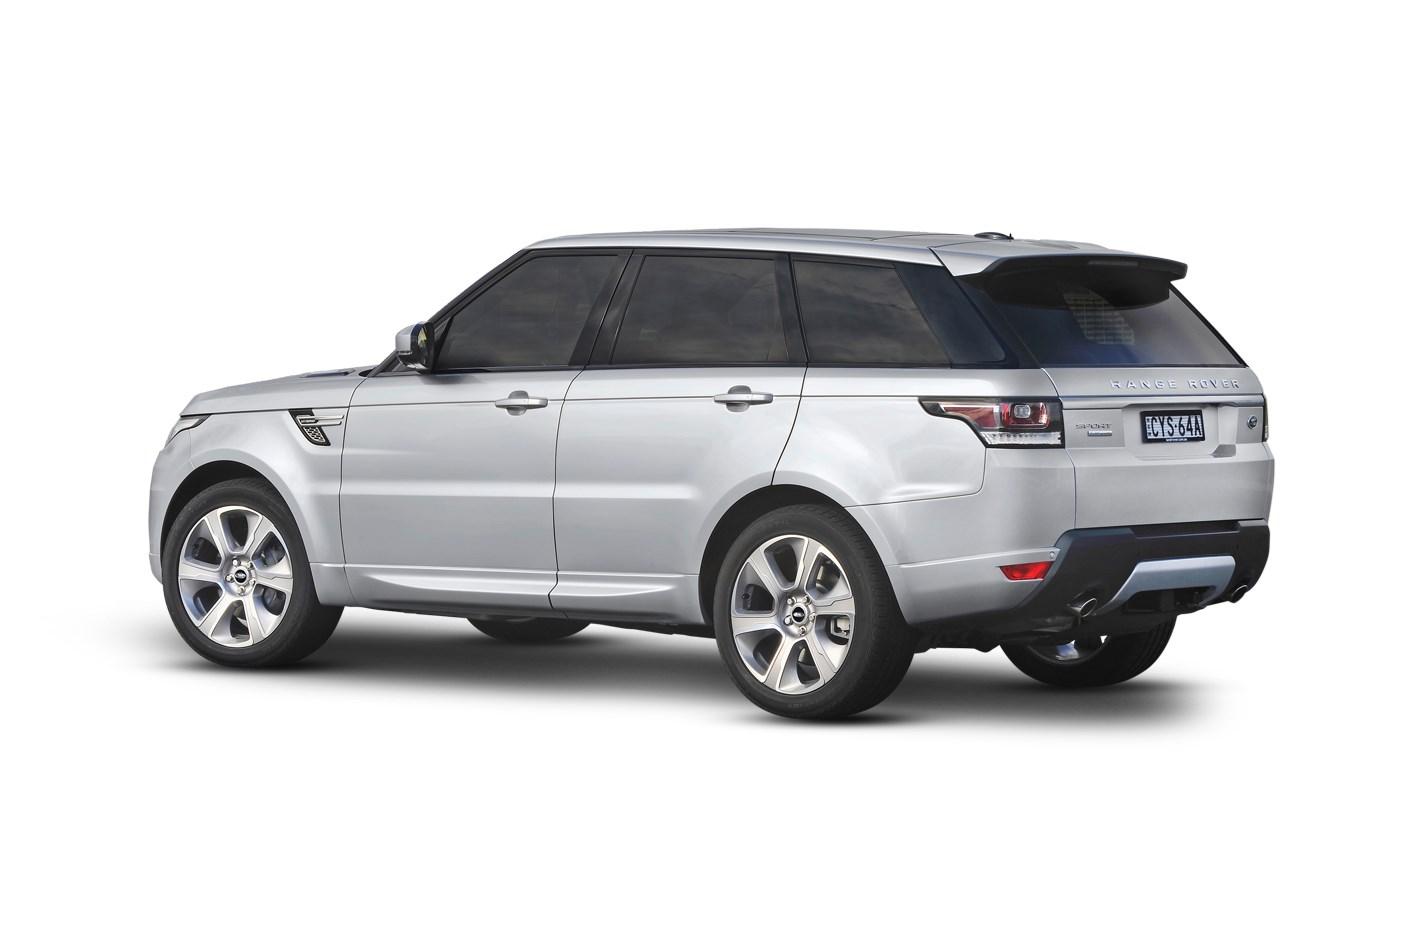 2016 Land Rover Range Sport 30 Tdv6 S 30l 6cyl Diesel Td6 Wiring Diagram Turbocharged Automatic Suv